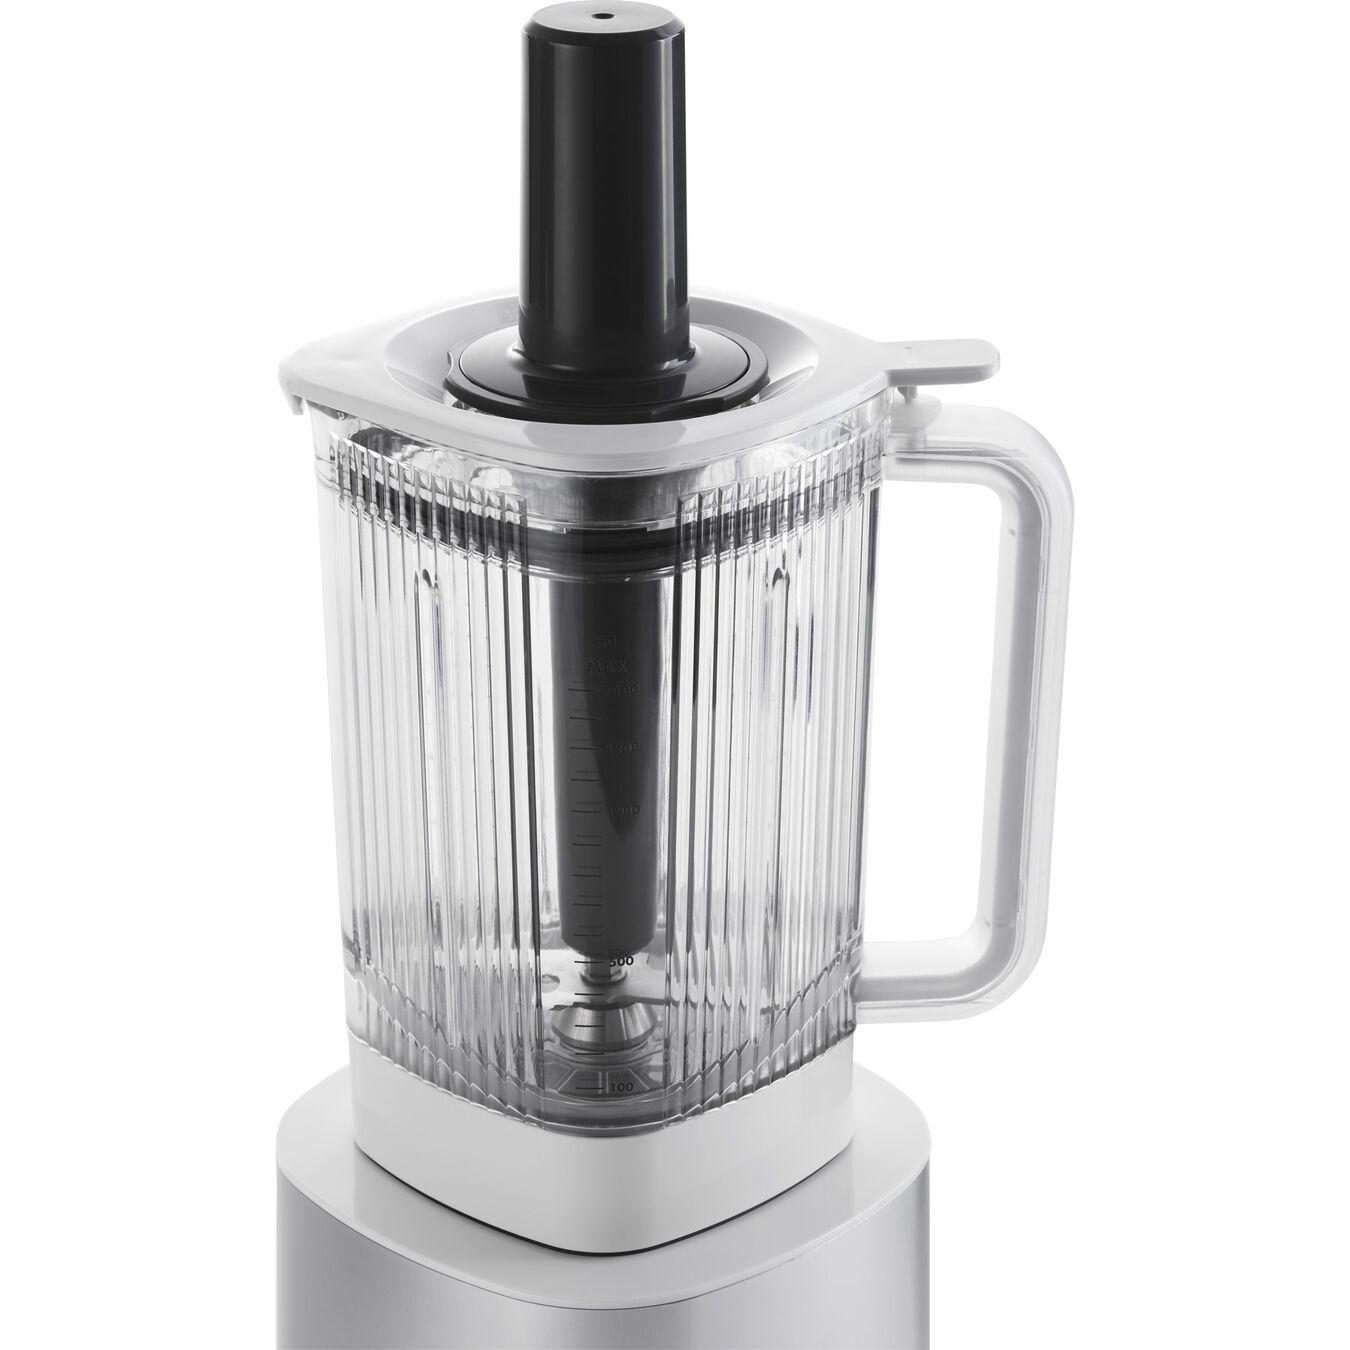 Table Blender - AC Motor, argento,,large 7